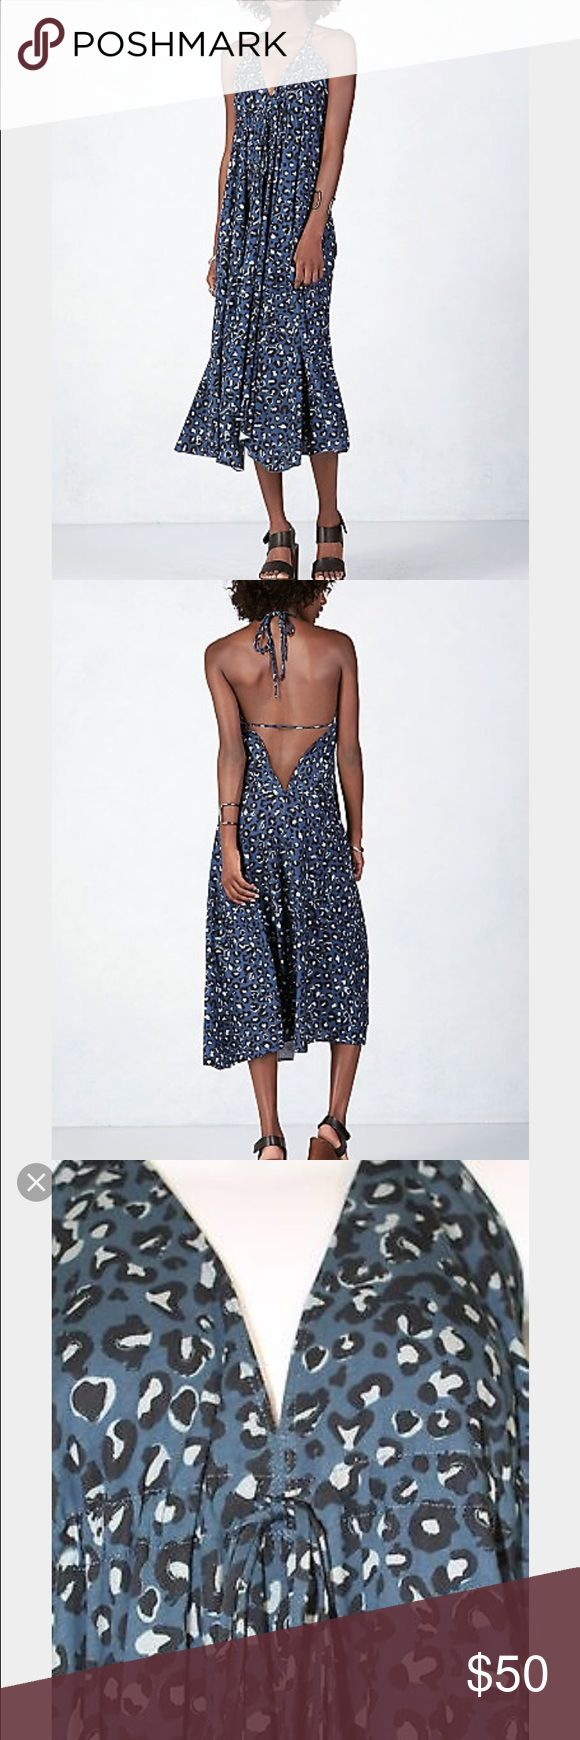 NWT True Religion leopard gypsy dress NWT True Religion leopard gypsy dress True Religion Dresses